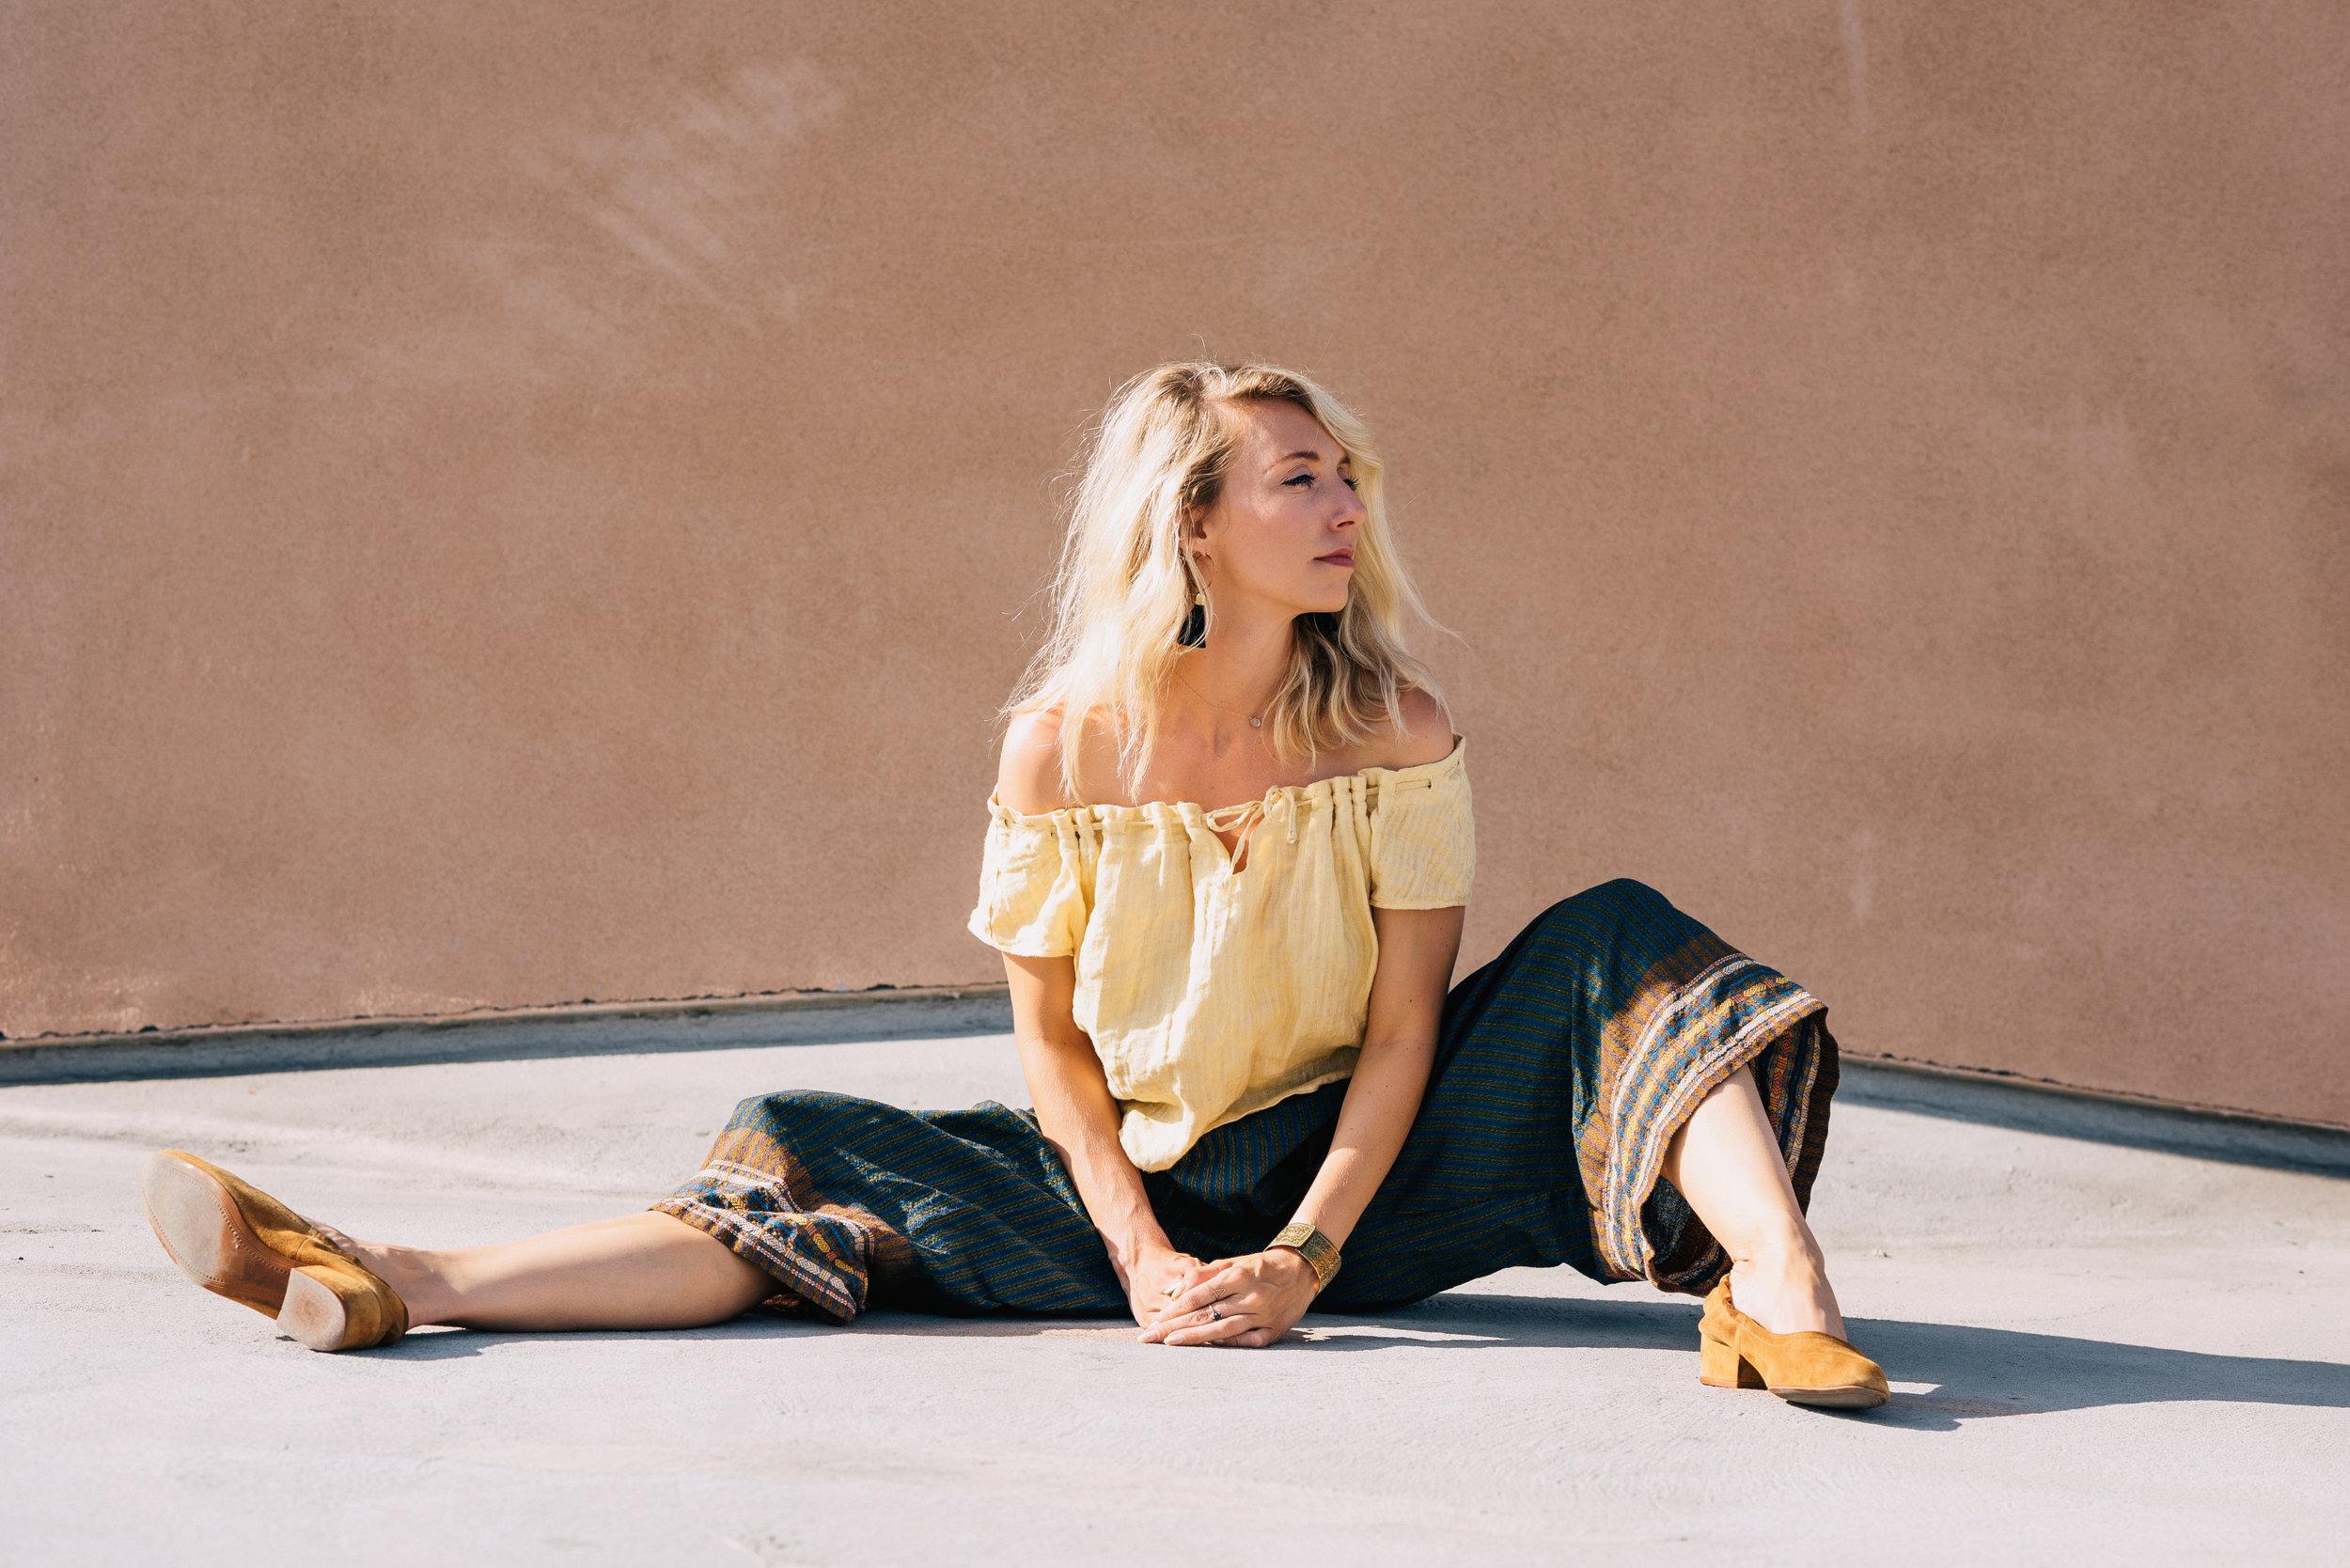 Courtney-look2-228 (2).jpg